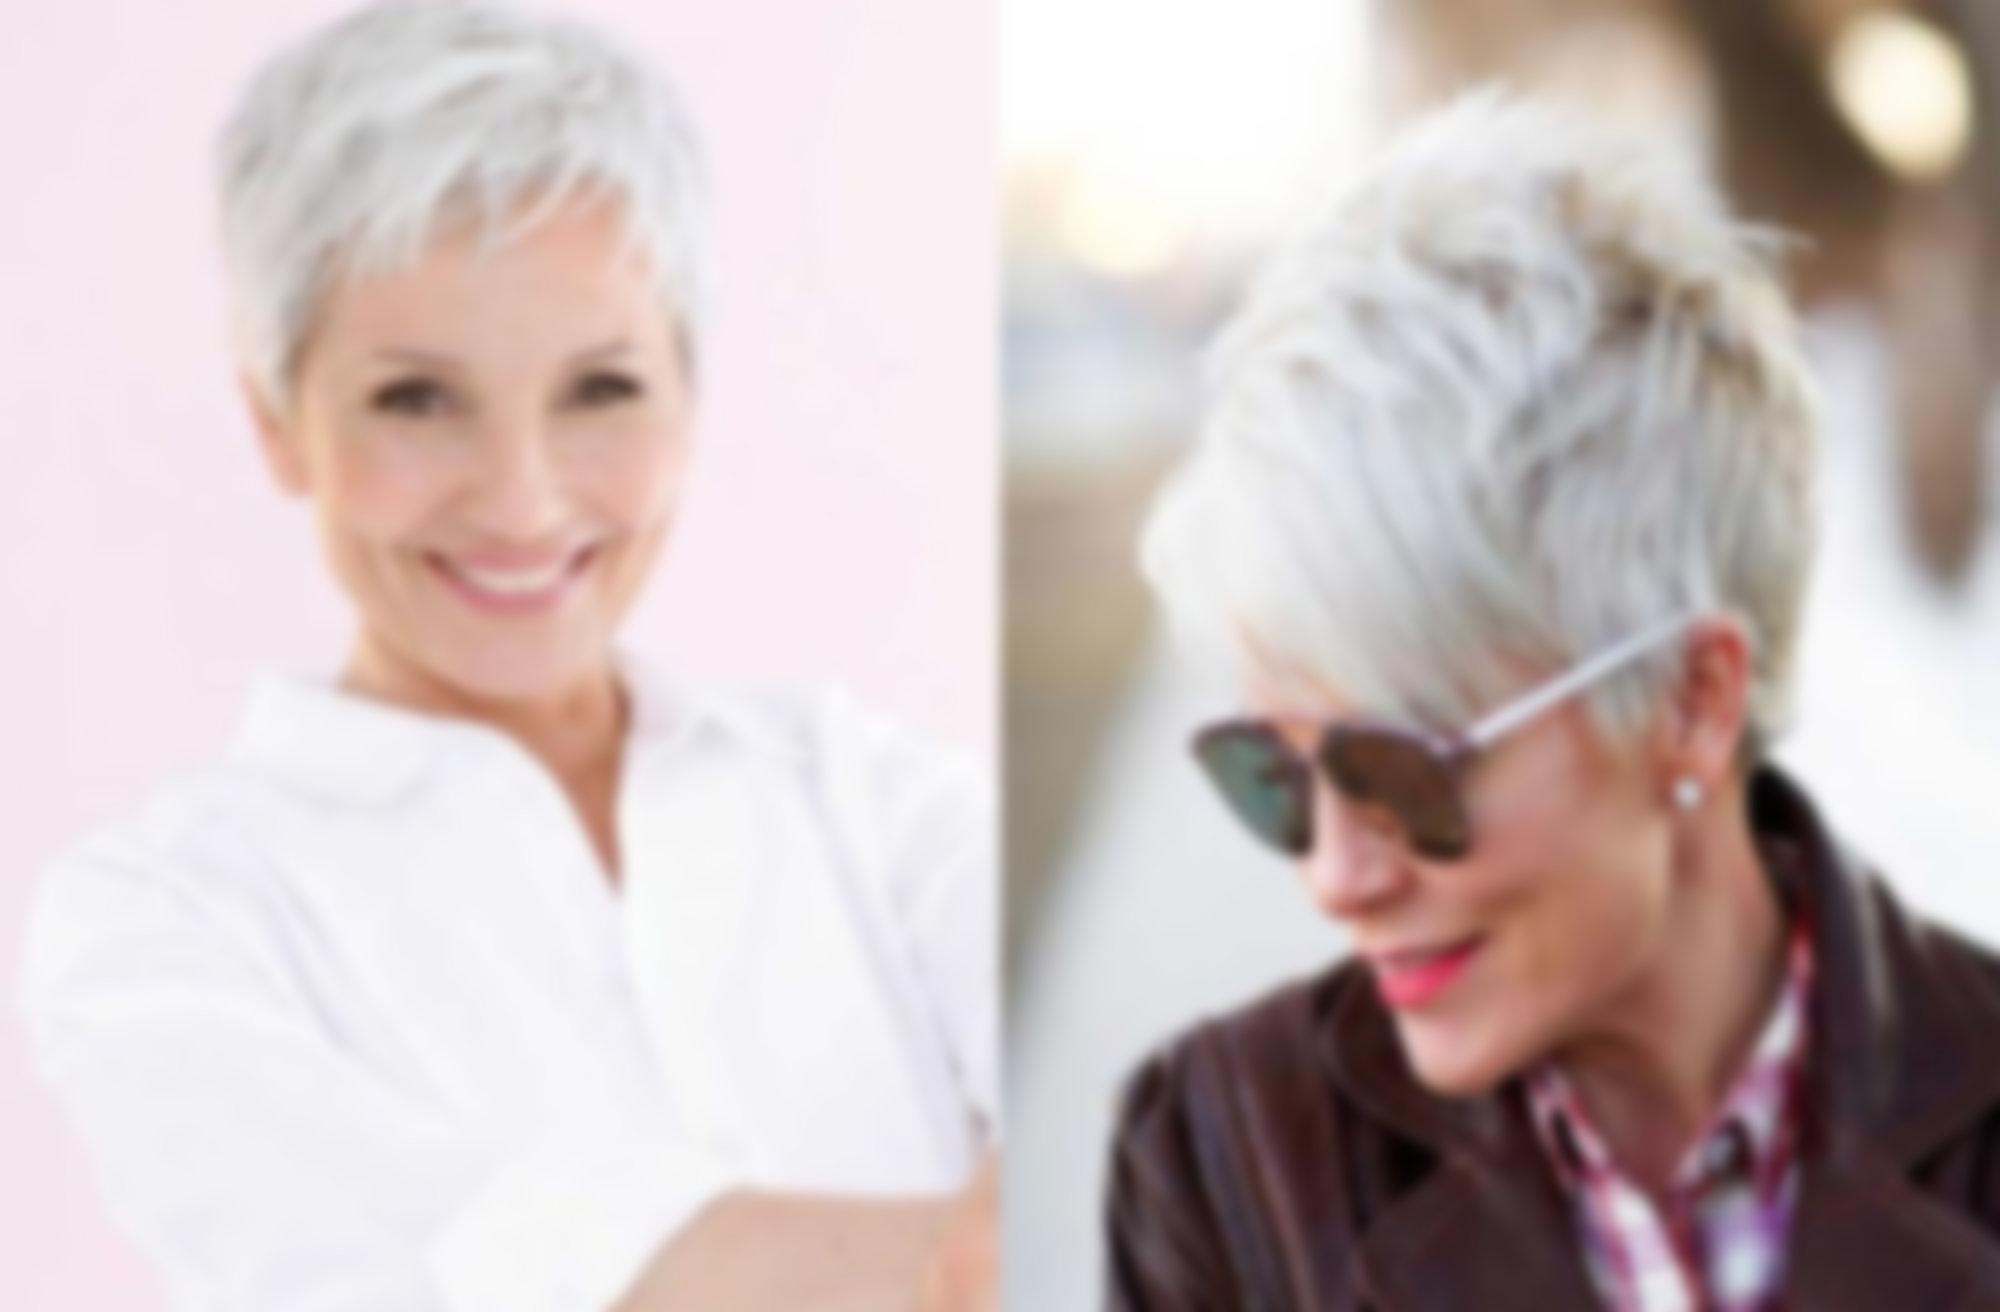 Изображение - Стрижки на средние после 50 proxy?url=https%3A%2F%2Fwww.kleo.ru%2Fimg%2Farticles%2FShort-Pixie-Hair-cuts-and-Hairstyles-for-Older-Women-for-2018-2019-Newest-Short-Hair-Colors-13